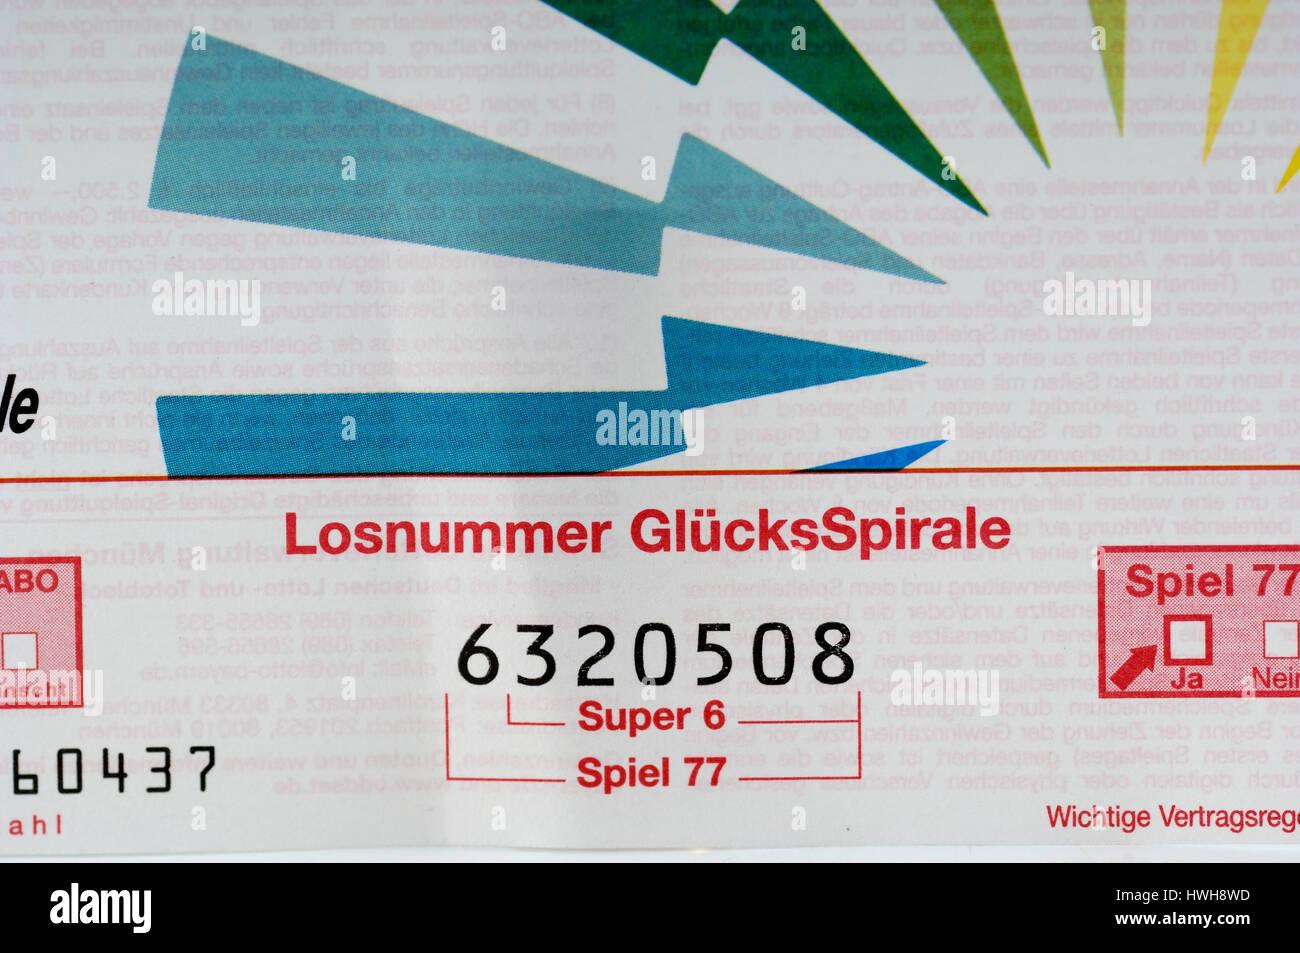 Lottery Bill Lottoschein lotto player, lotto profit, lotto system, lotto winner, lotto society, lotto profit, lotto Stock Photo